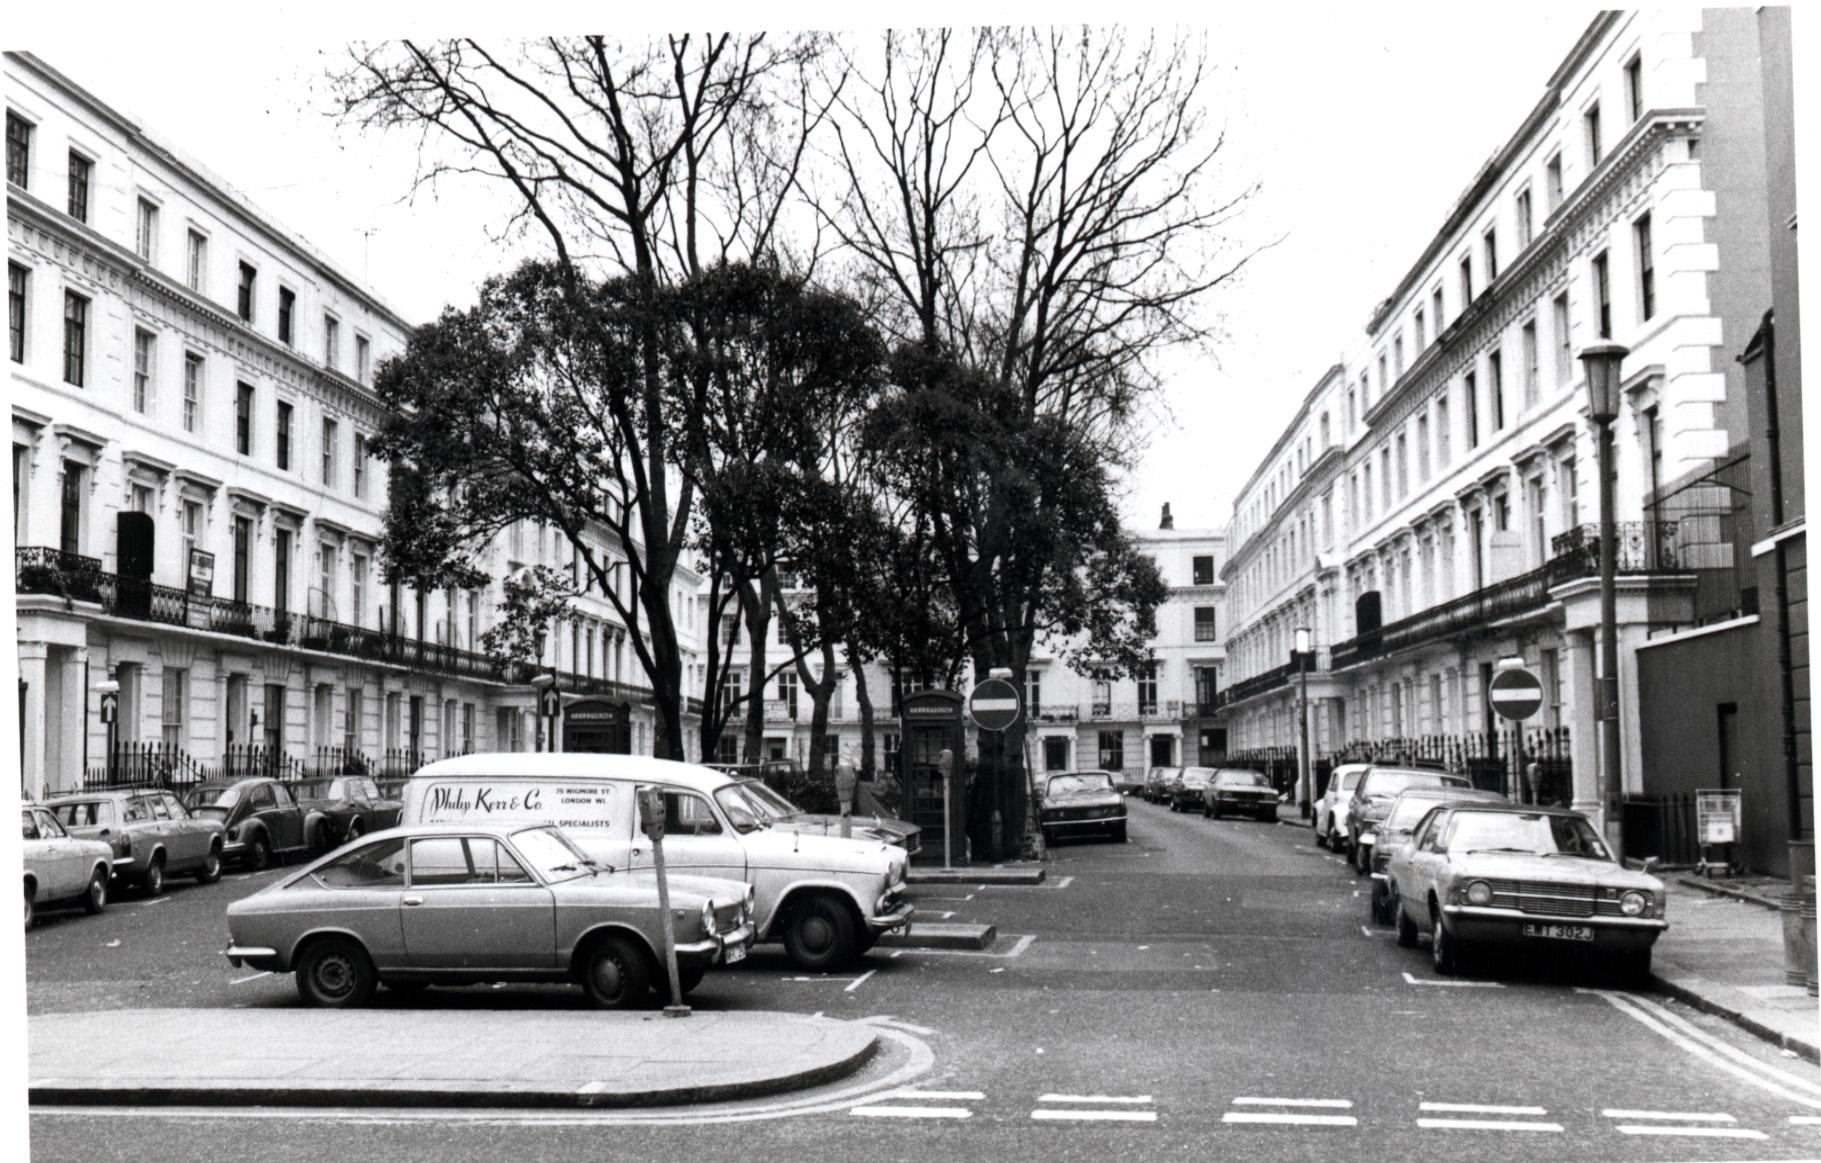 Wellington Square - looking south from Kings Road 1975 KS 4125.JPG